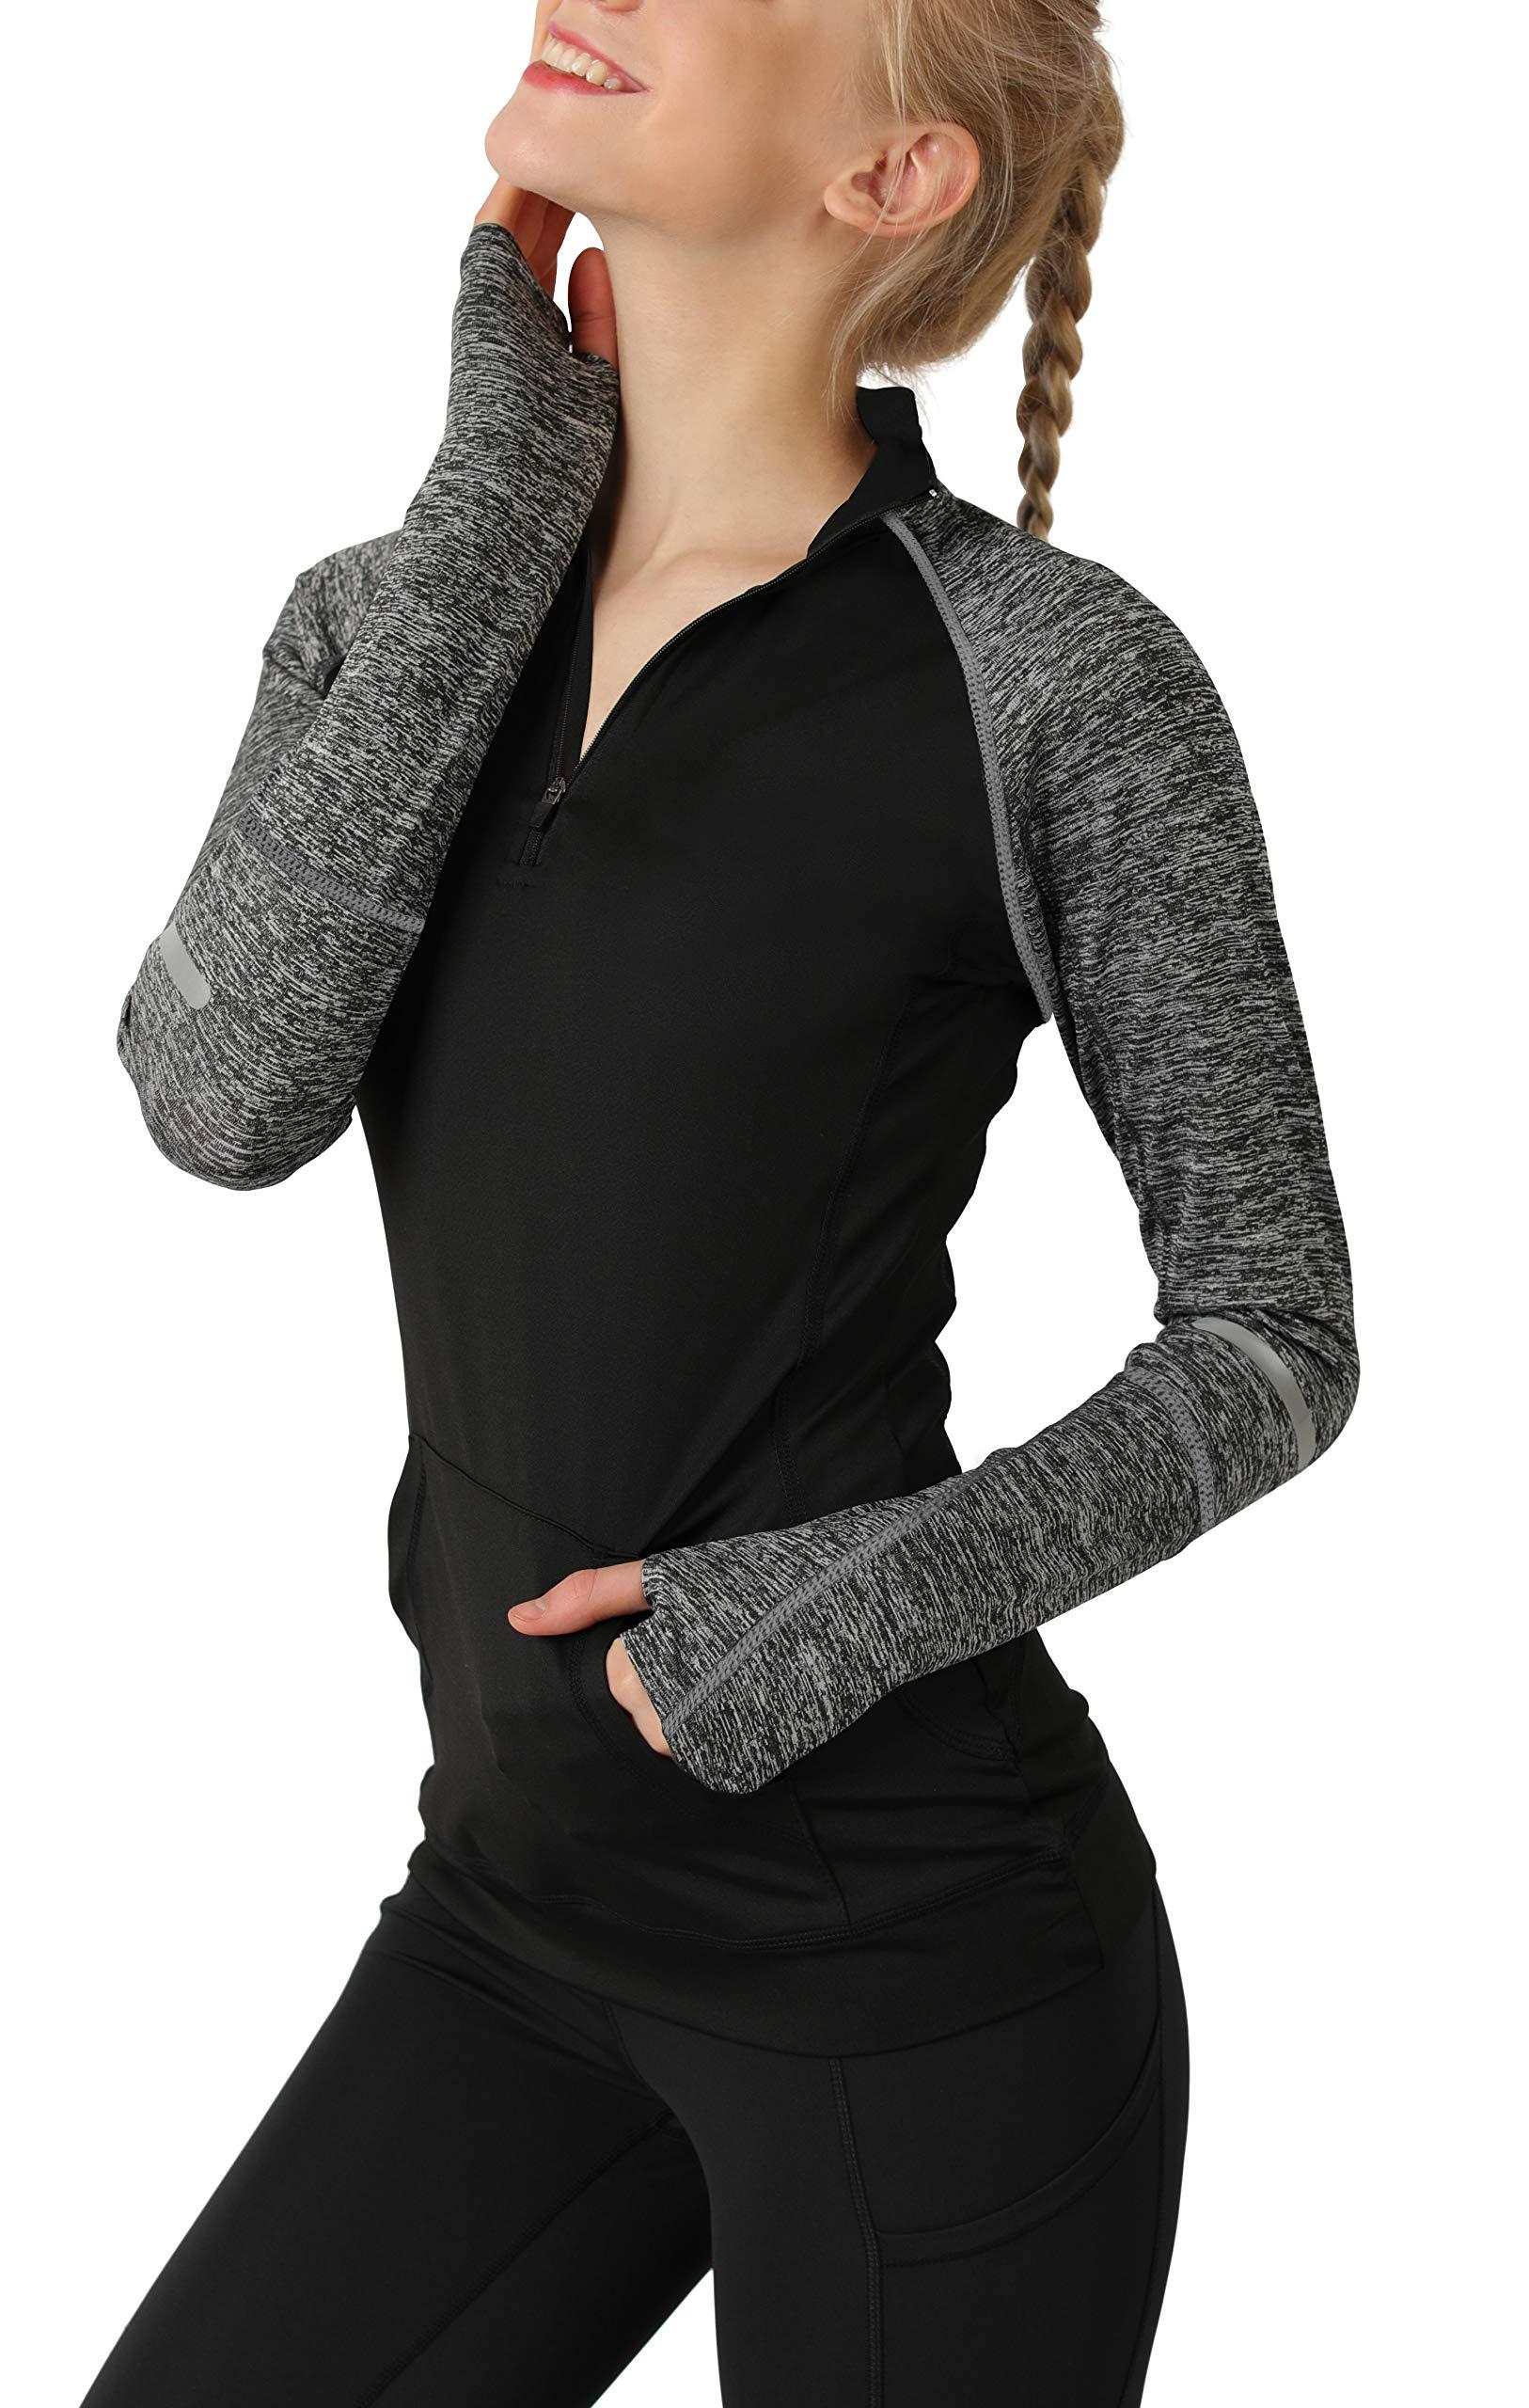 Cityoung Women's Yoga Long Sleeves Half Zip Sweatshirt Girl Athletic Workout Running Jacket bk l by Cityoung